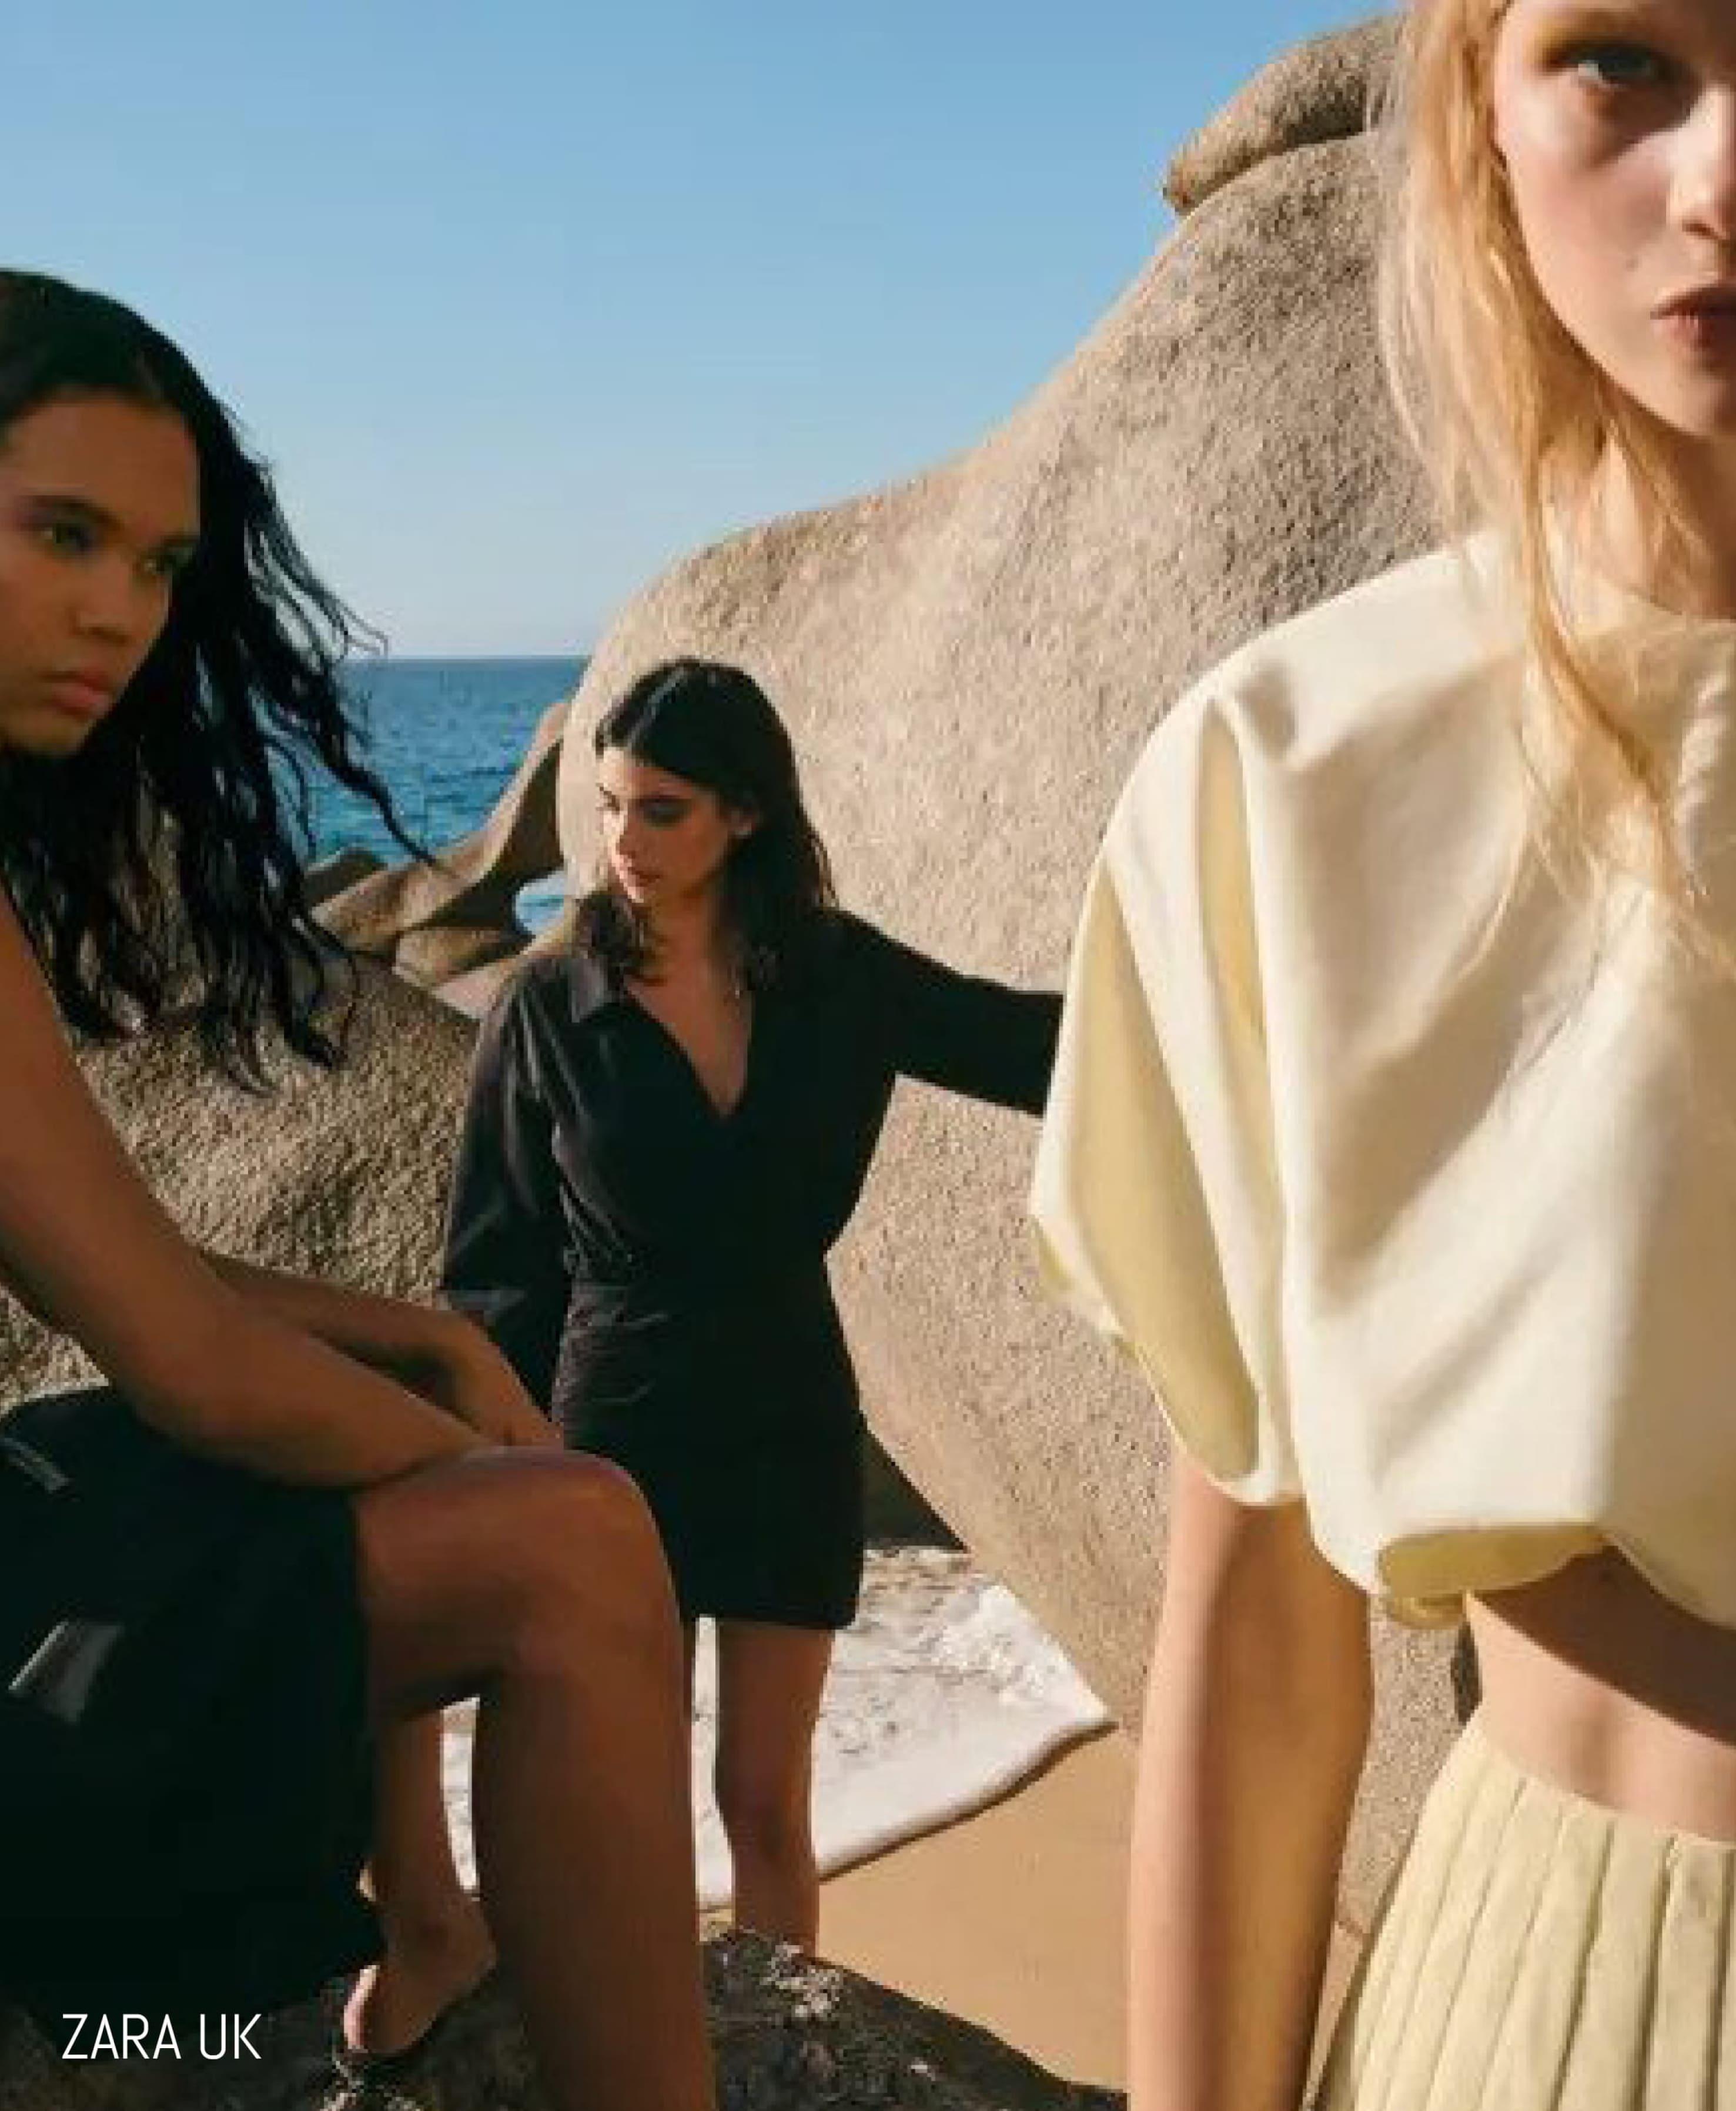 Models on a beach for ZARA UK